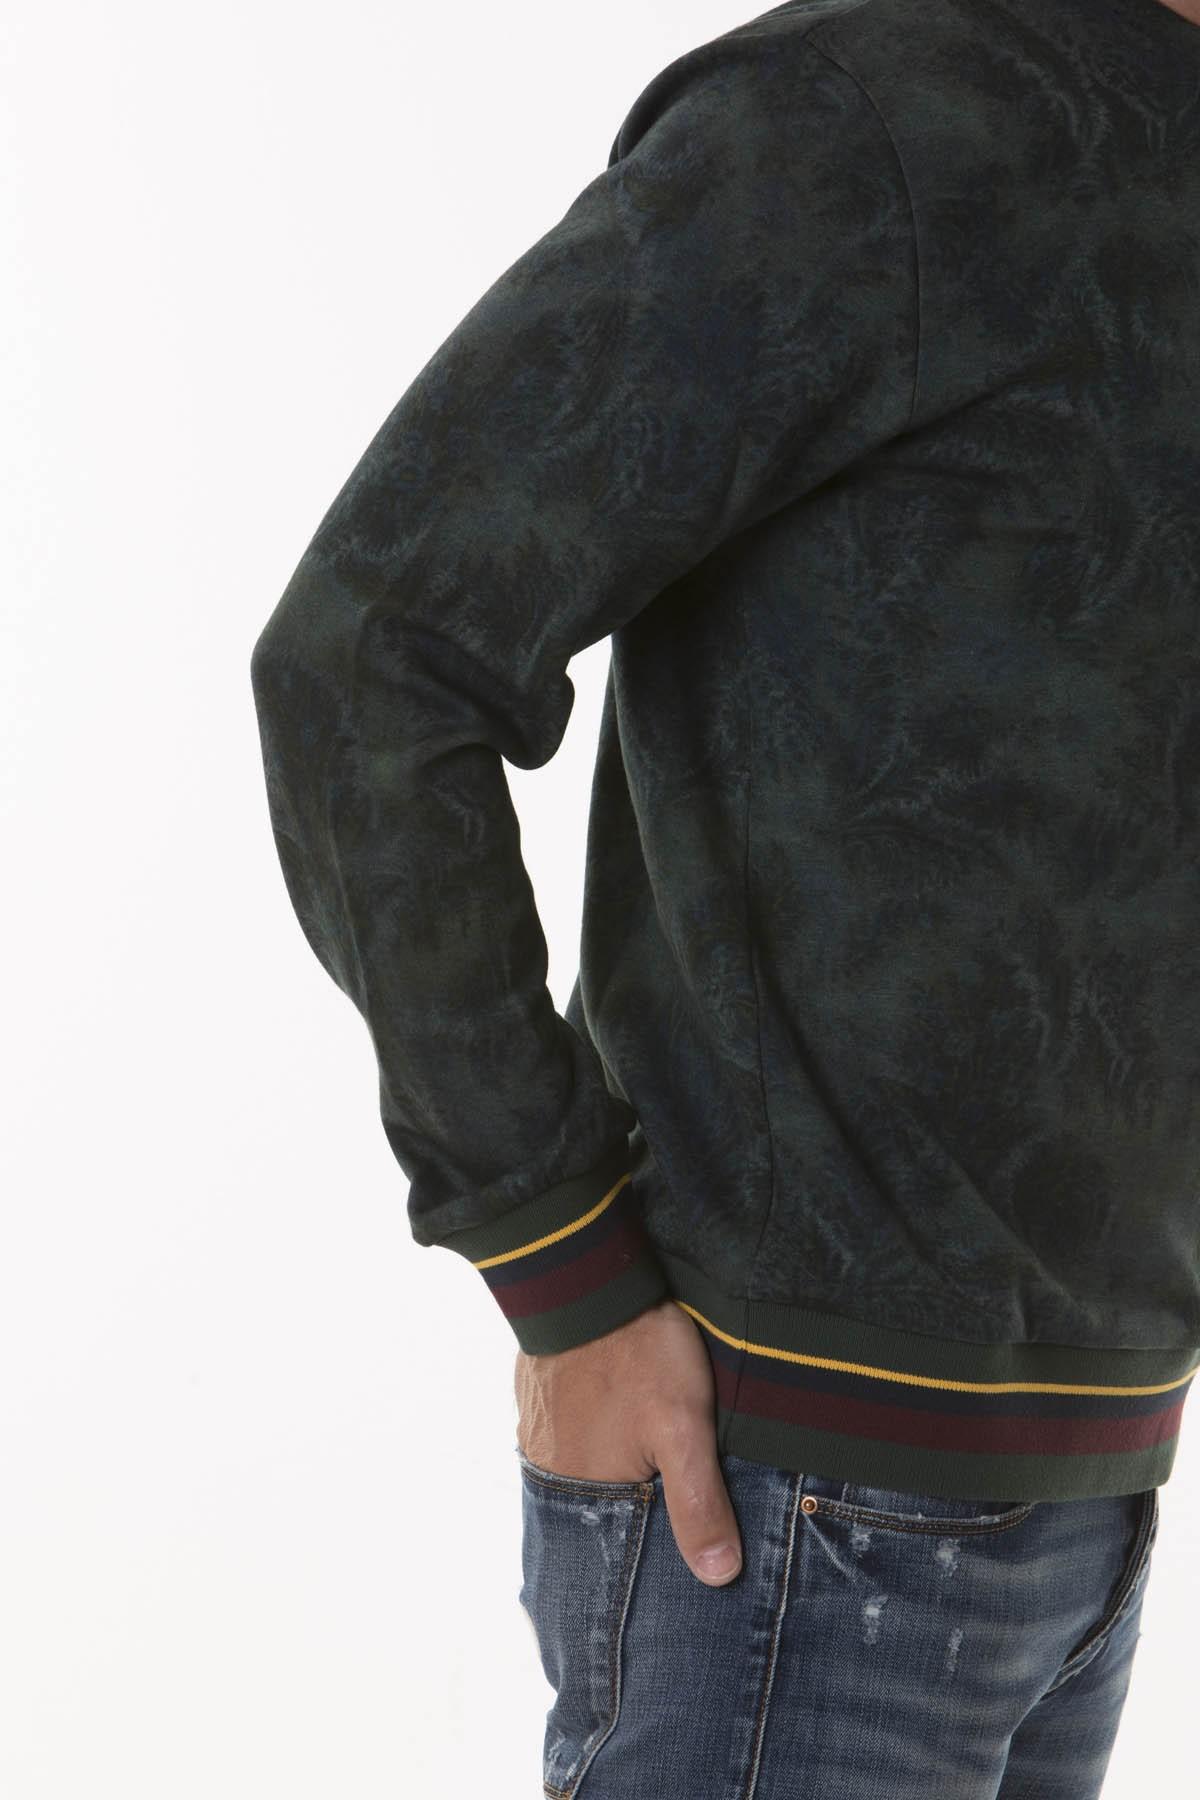 buy online 4eb3c 856b2 Felpa per uomo ETRO A/I 18-19